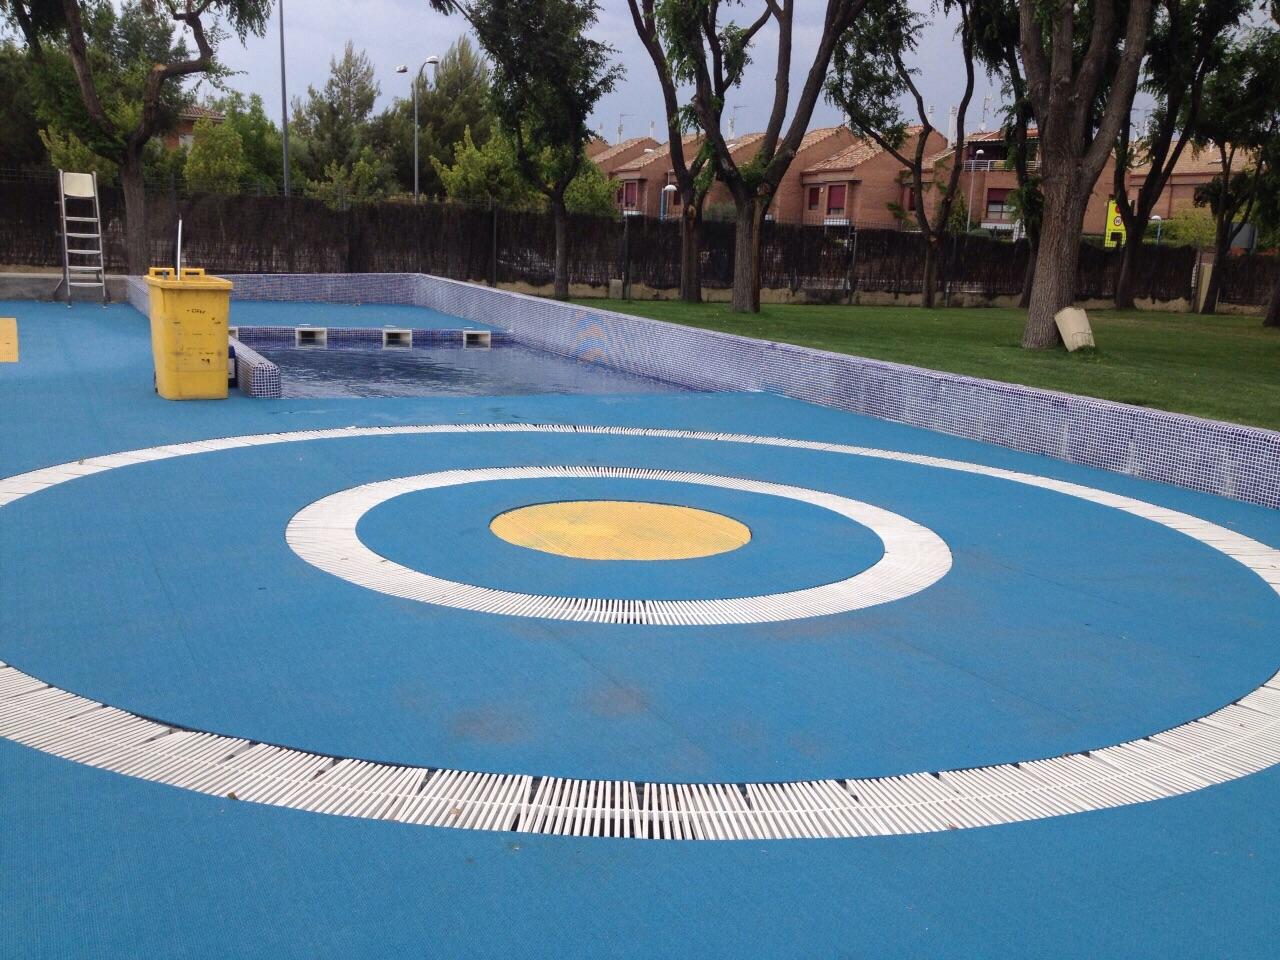 La piscina municipal de pinto abre el 13 de junio y for Piscina municipal de arteixo